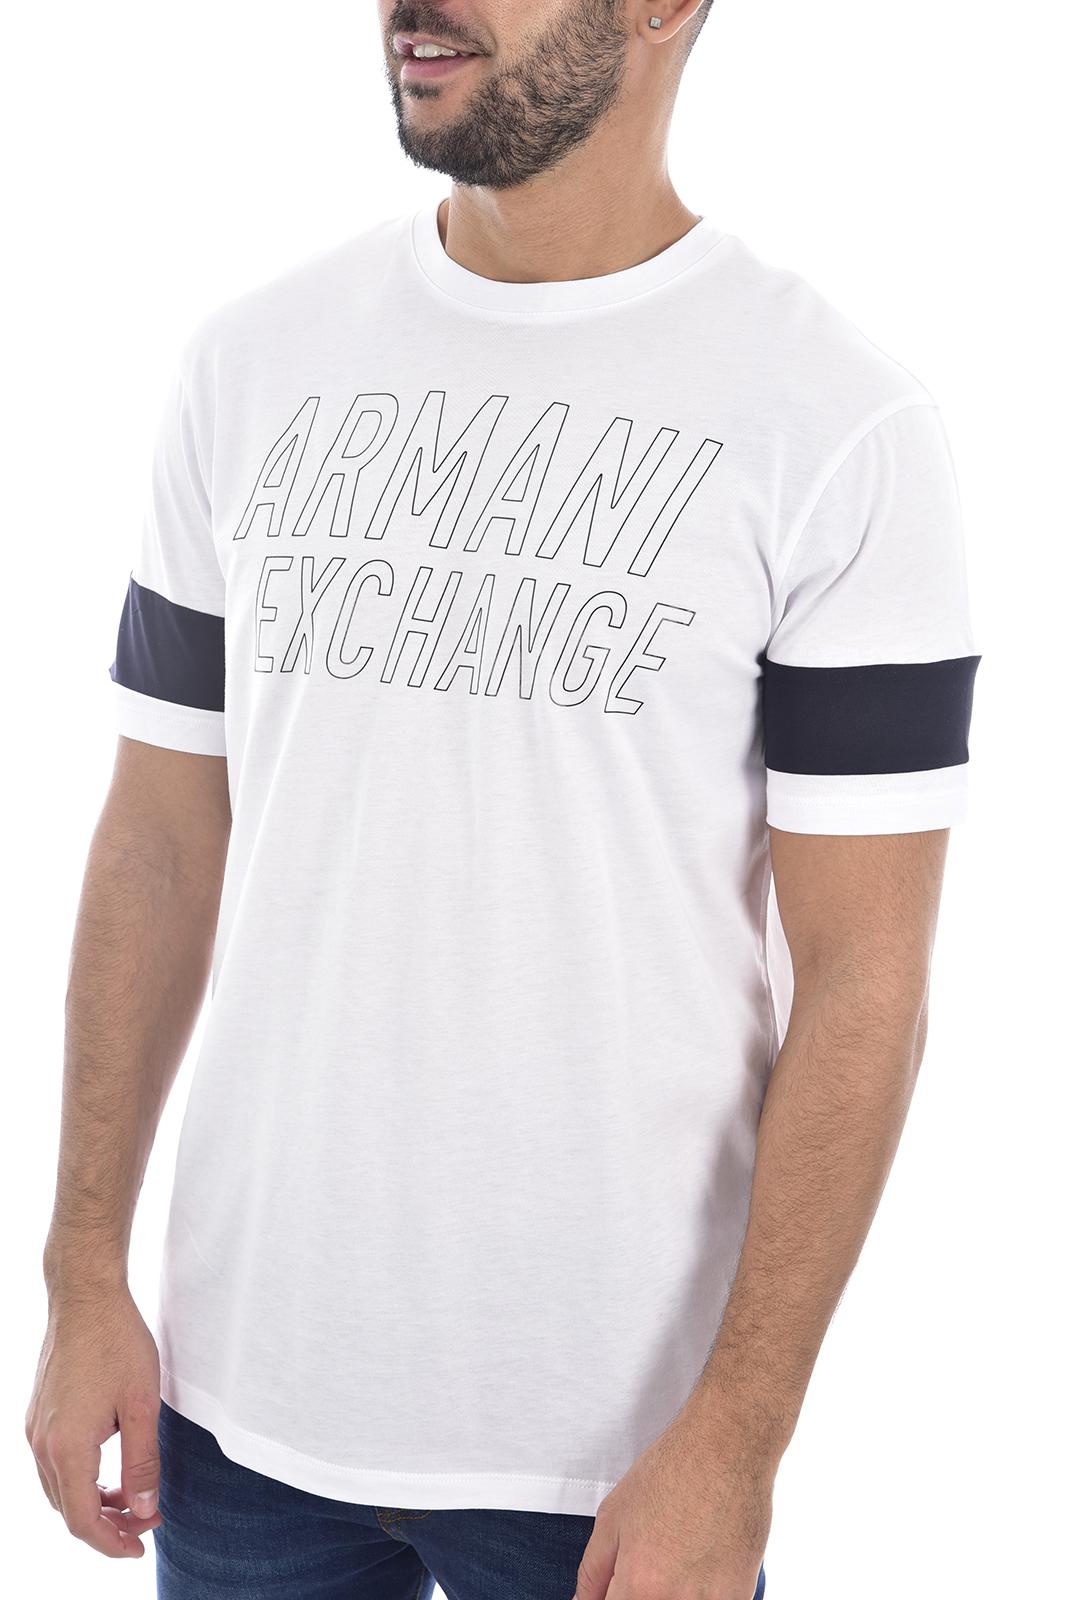 T-S manches courtes  Armani exchange 6gztbw zjh4z BLANC